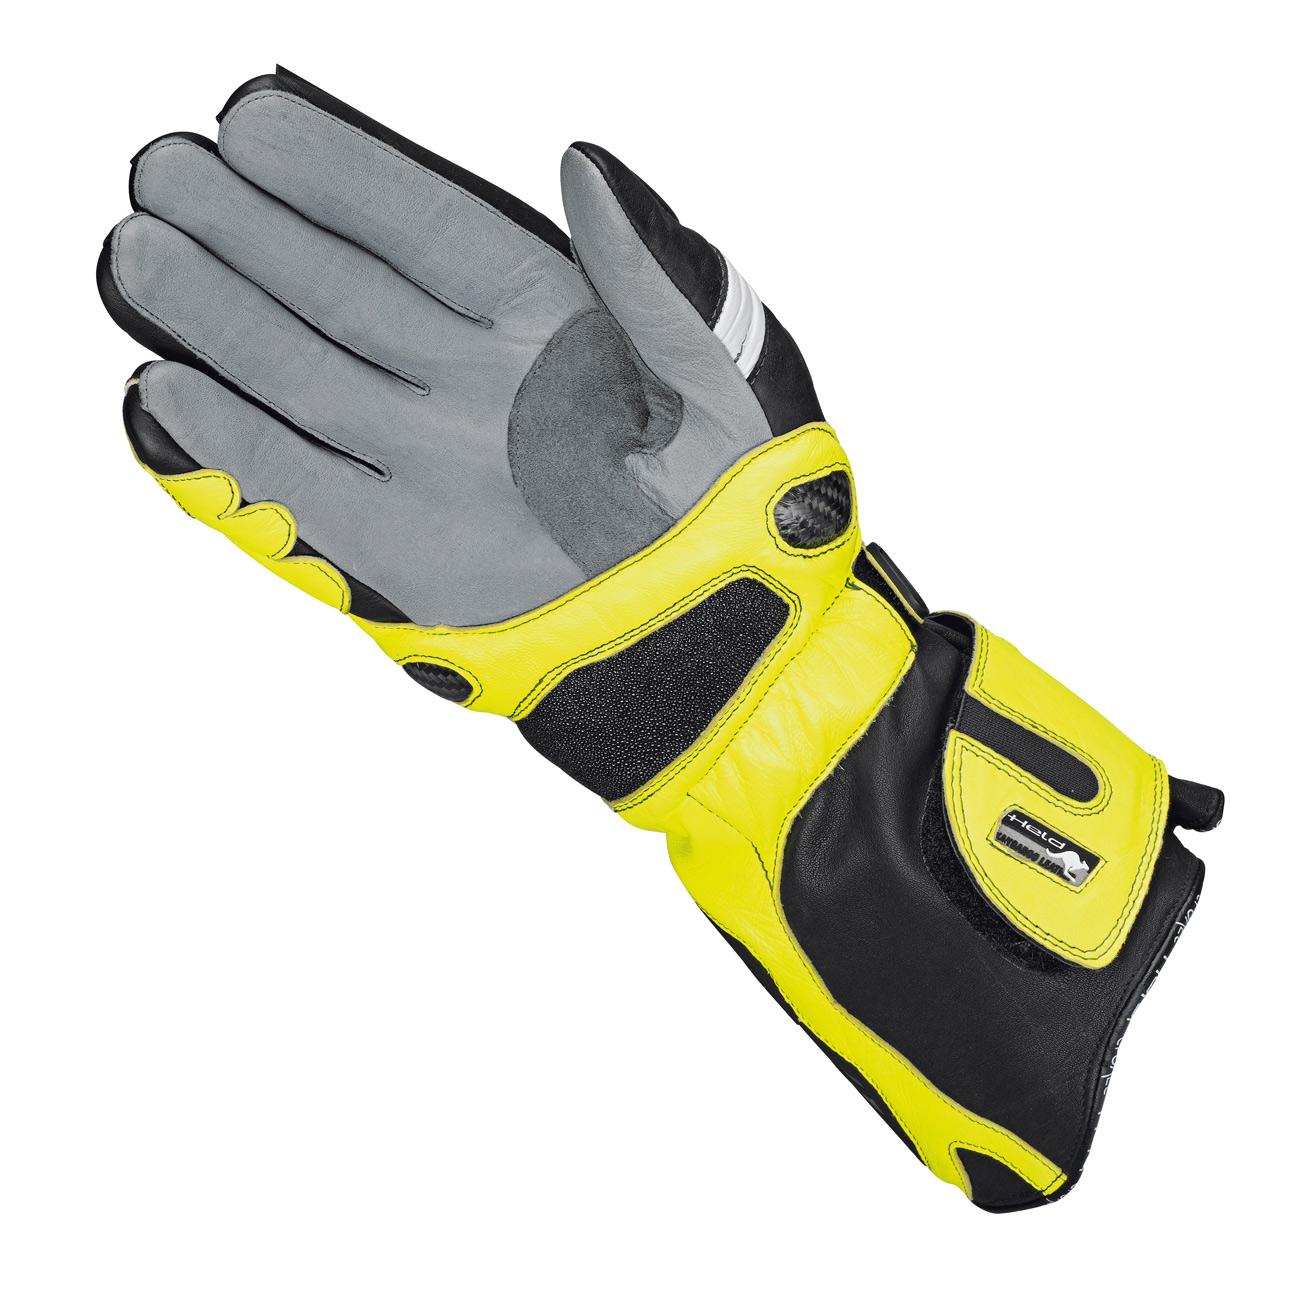 held titan evo gloves black fluo yellow he 2512 058 gloves. Black Bedroom Furniture Sets. Home Design Ideas